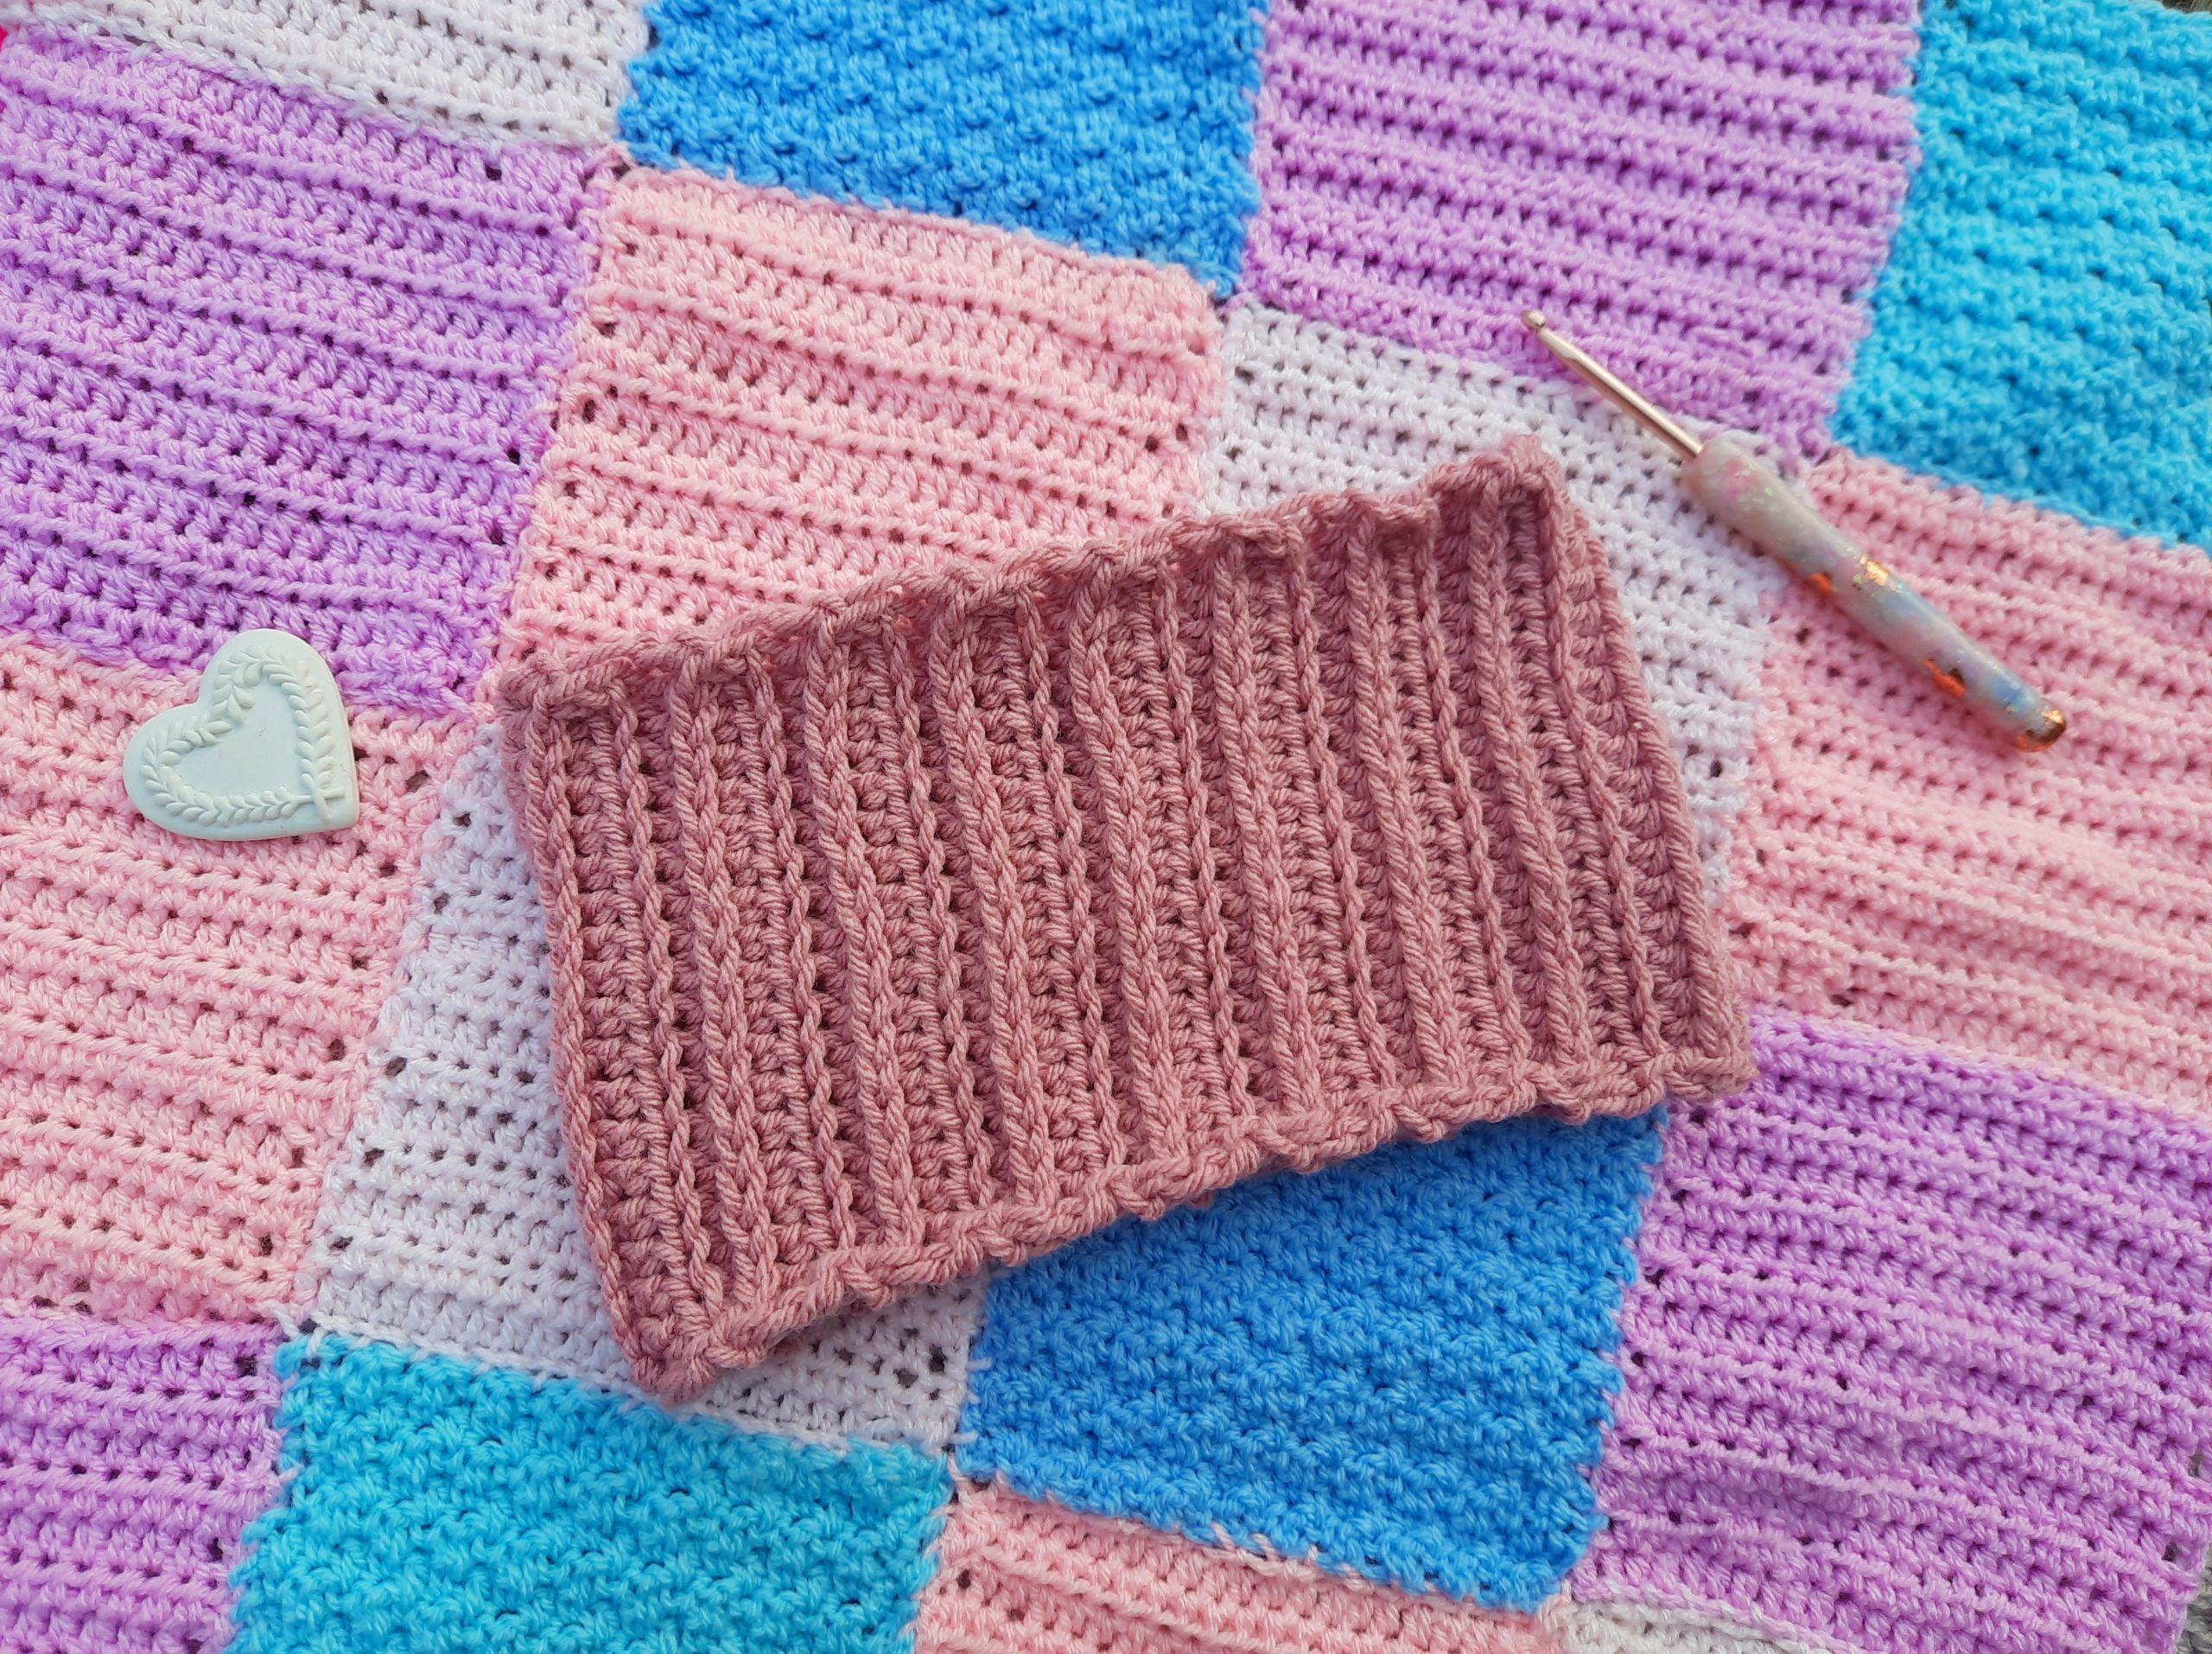 Crochet a Knit Like Headband